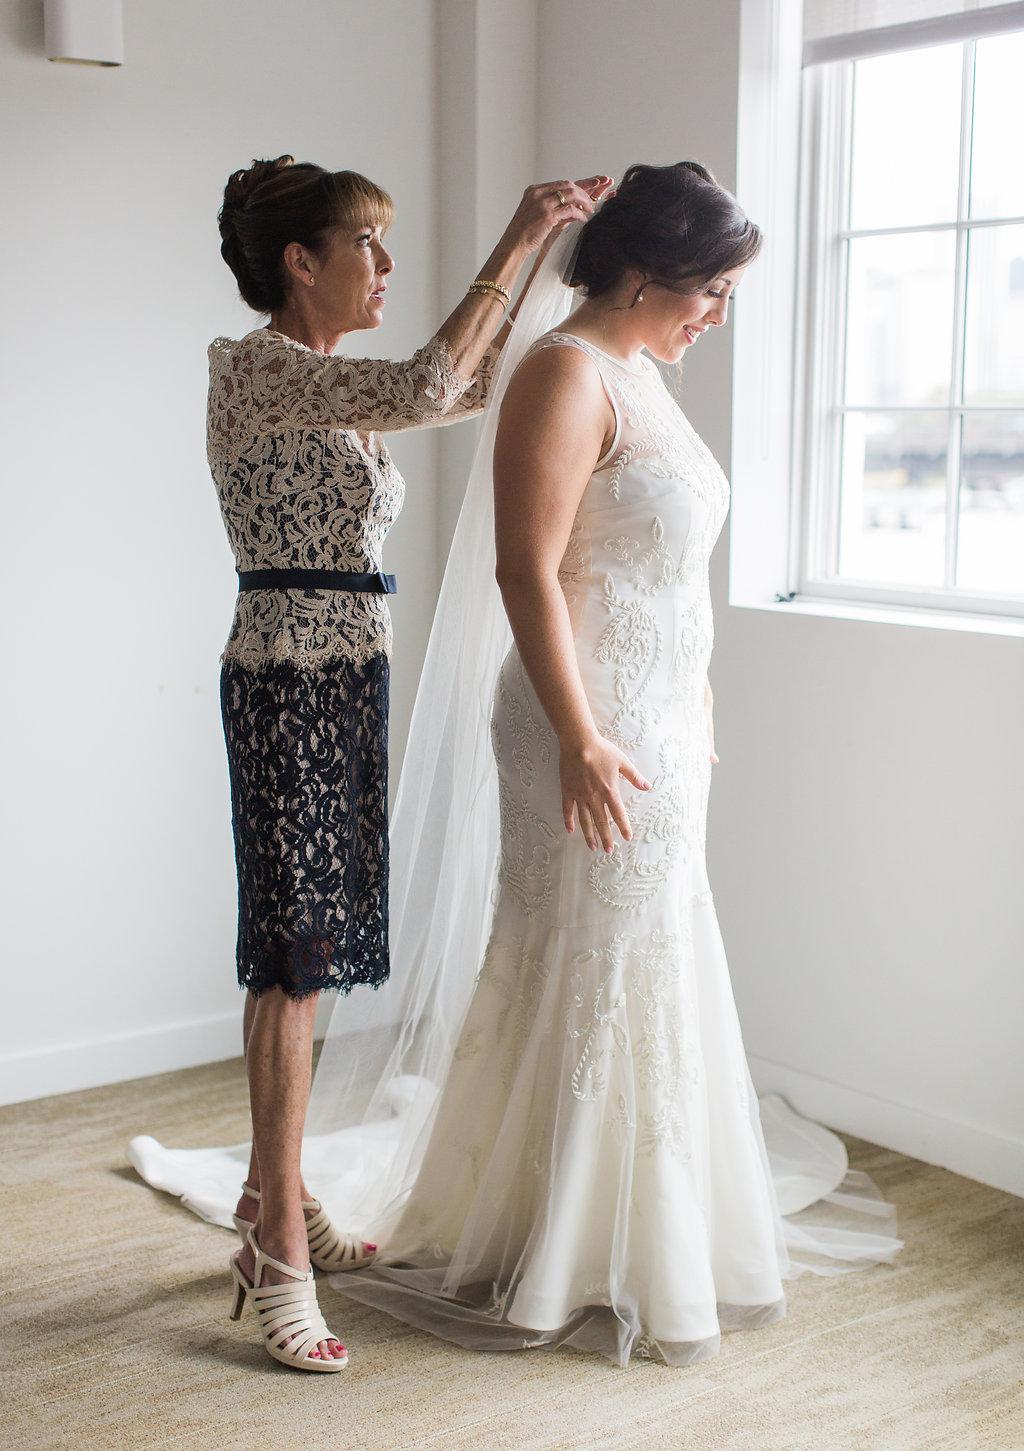 Bridalbliss.com | Portland Wedding | Oregon Event Planning and Design | Amanda K Photography